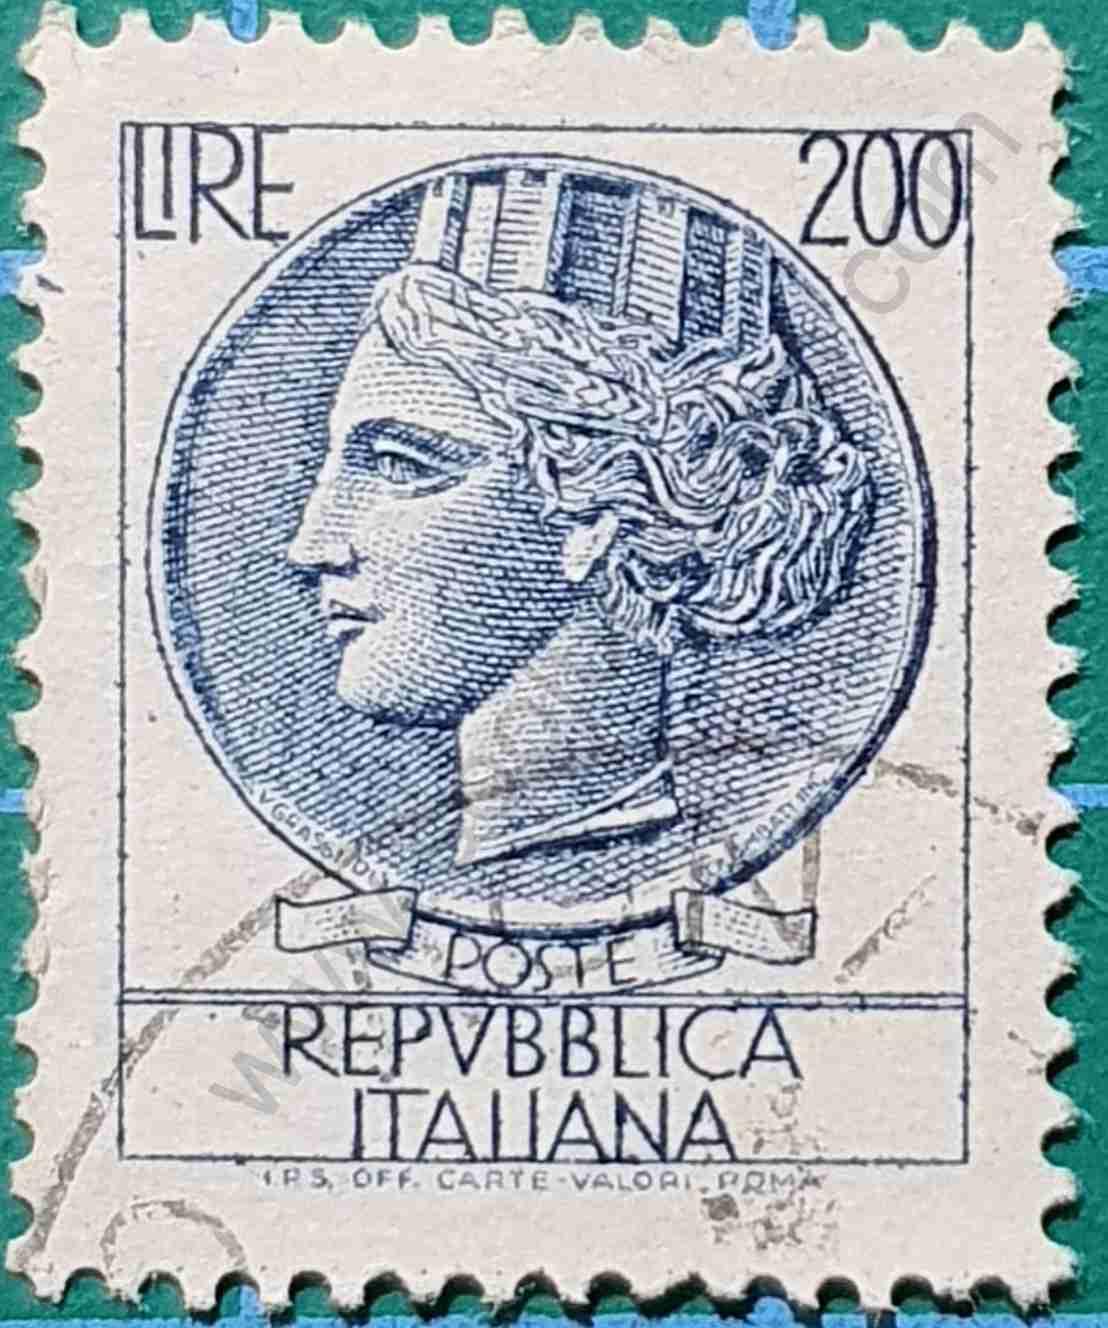 Sello Moneda Siracusa 200 Liras - Italia 1968